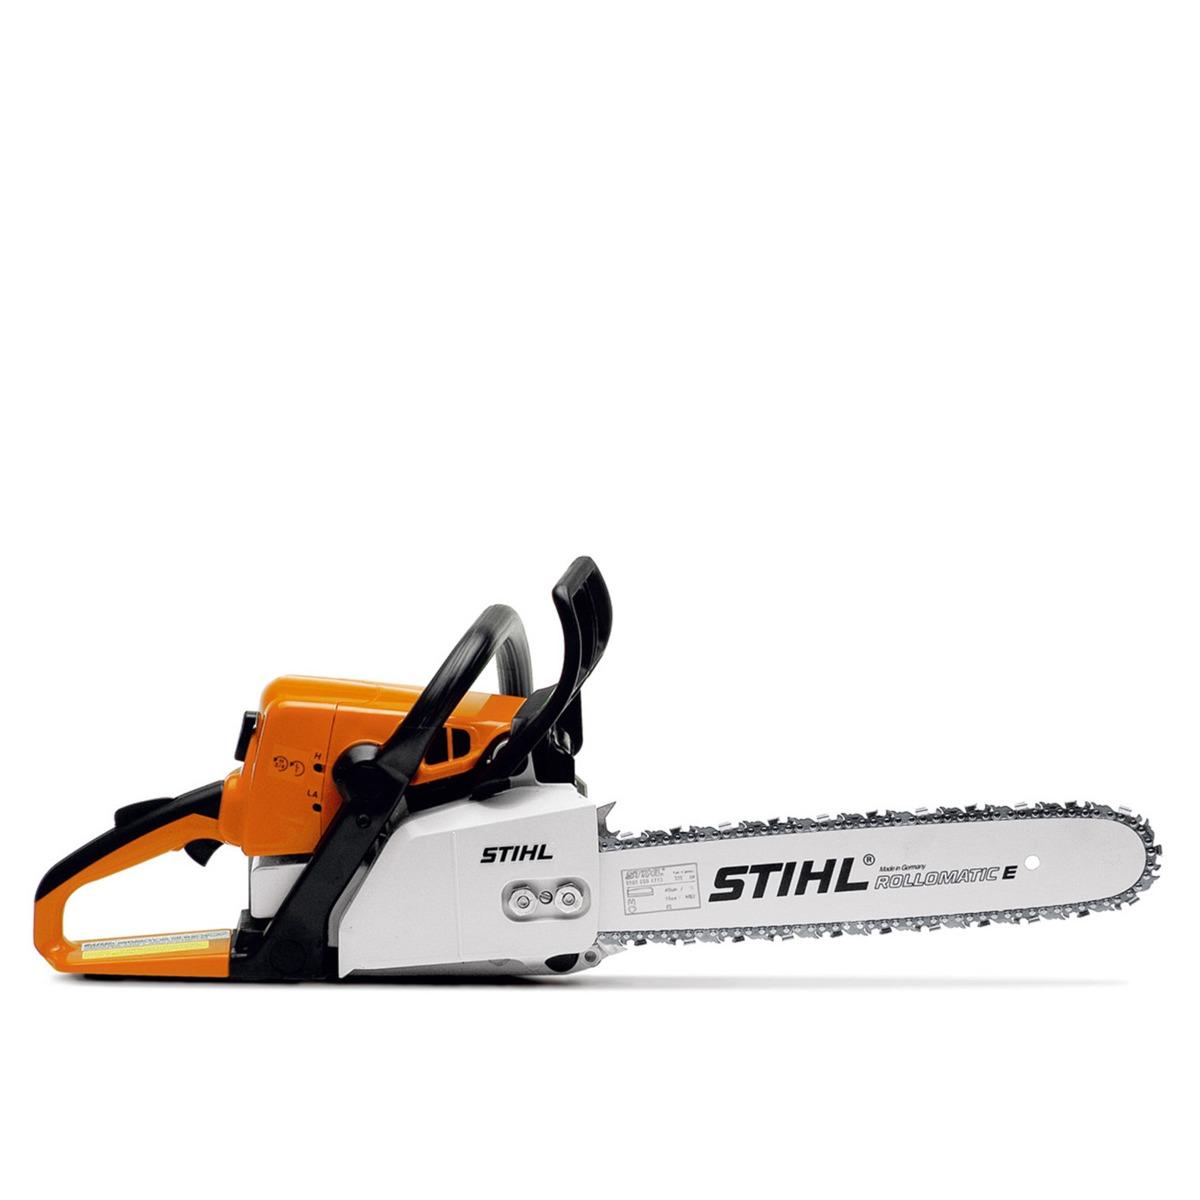 STIHL MS 250 18